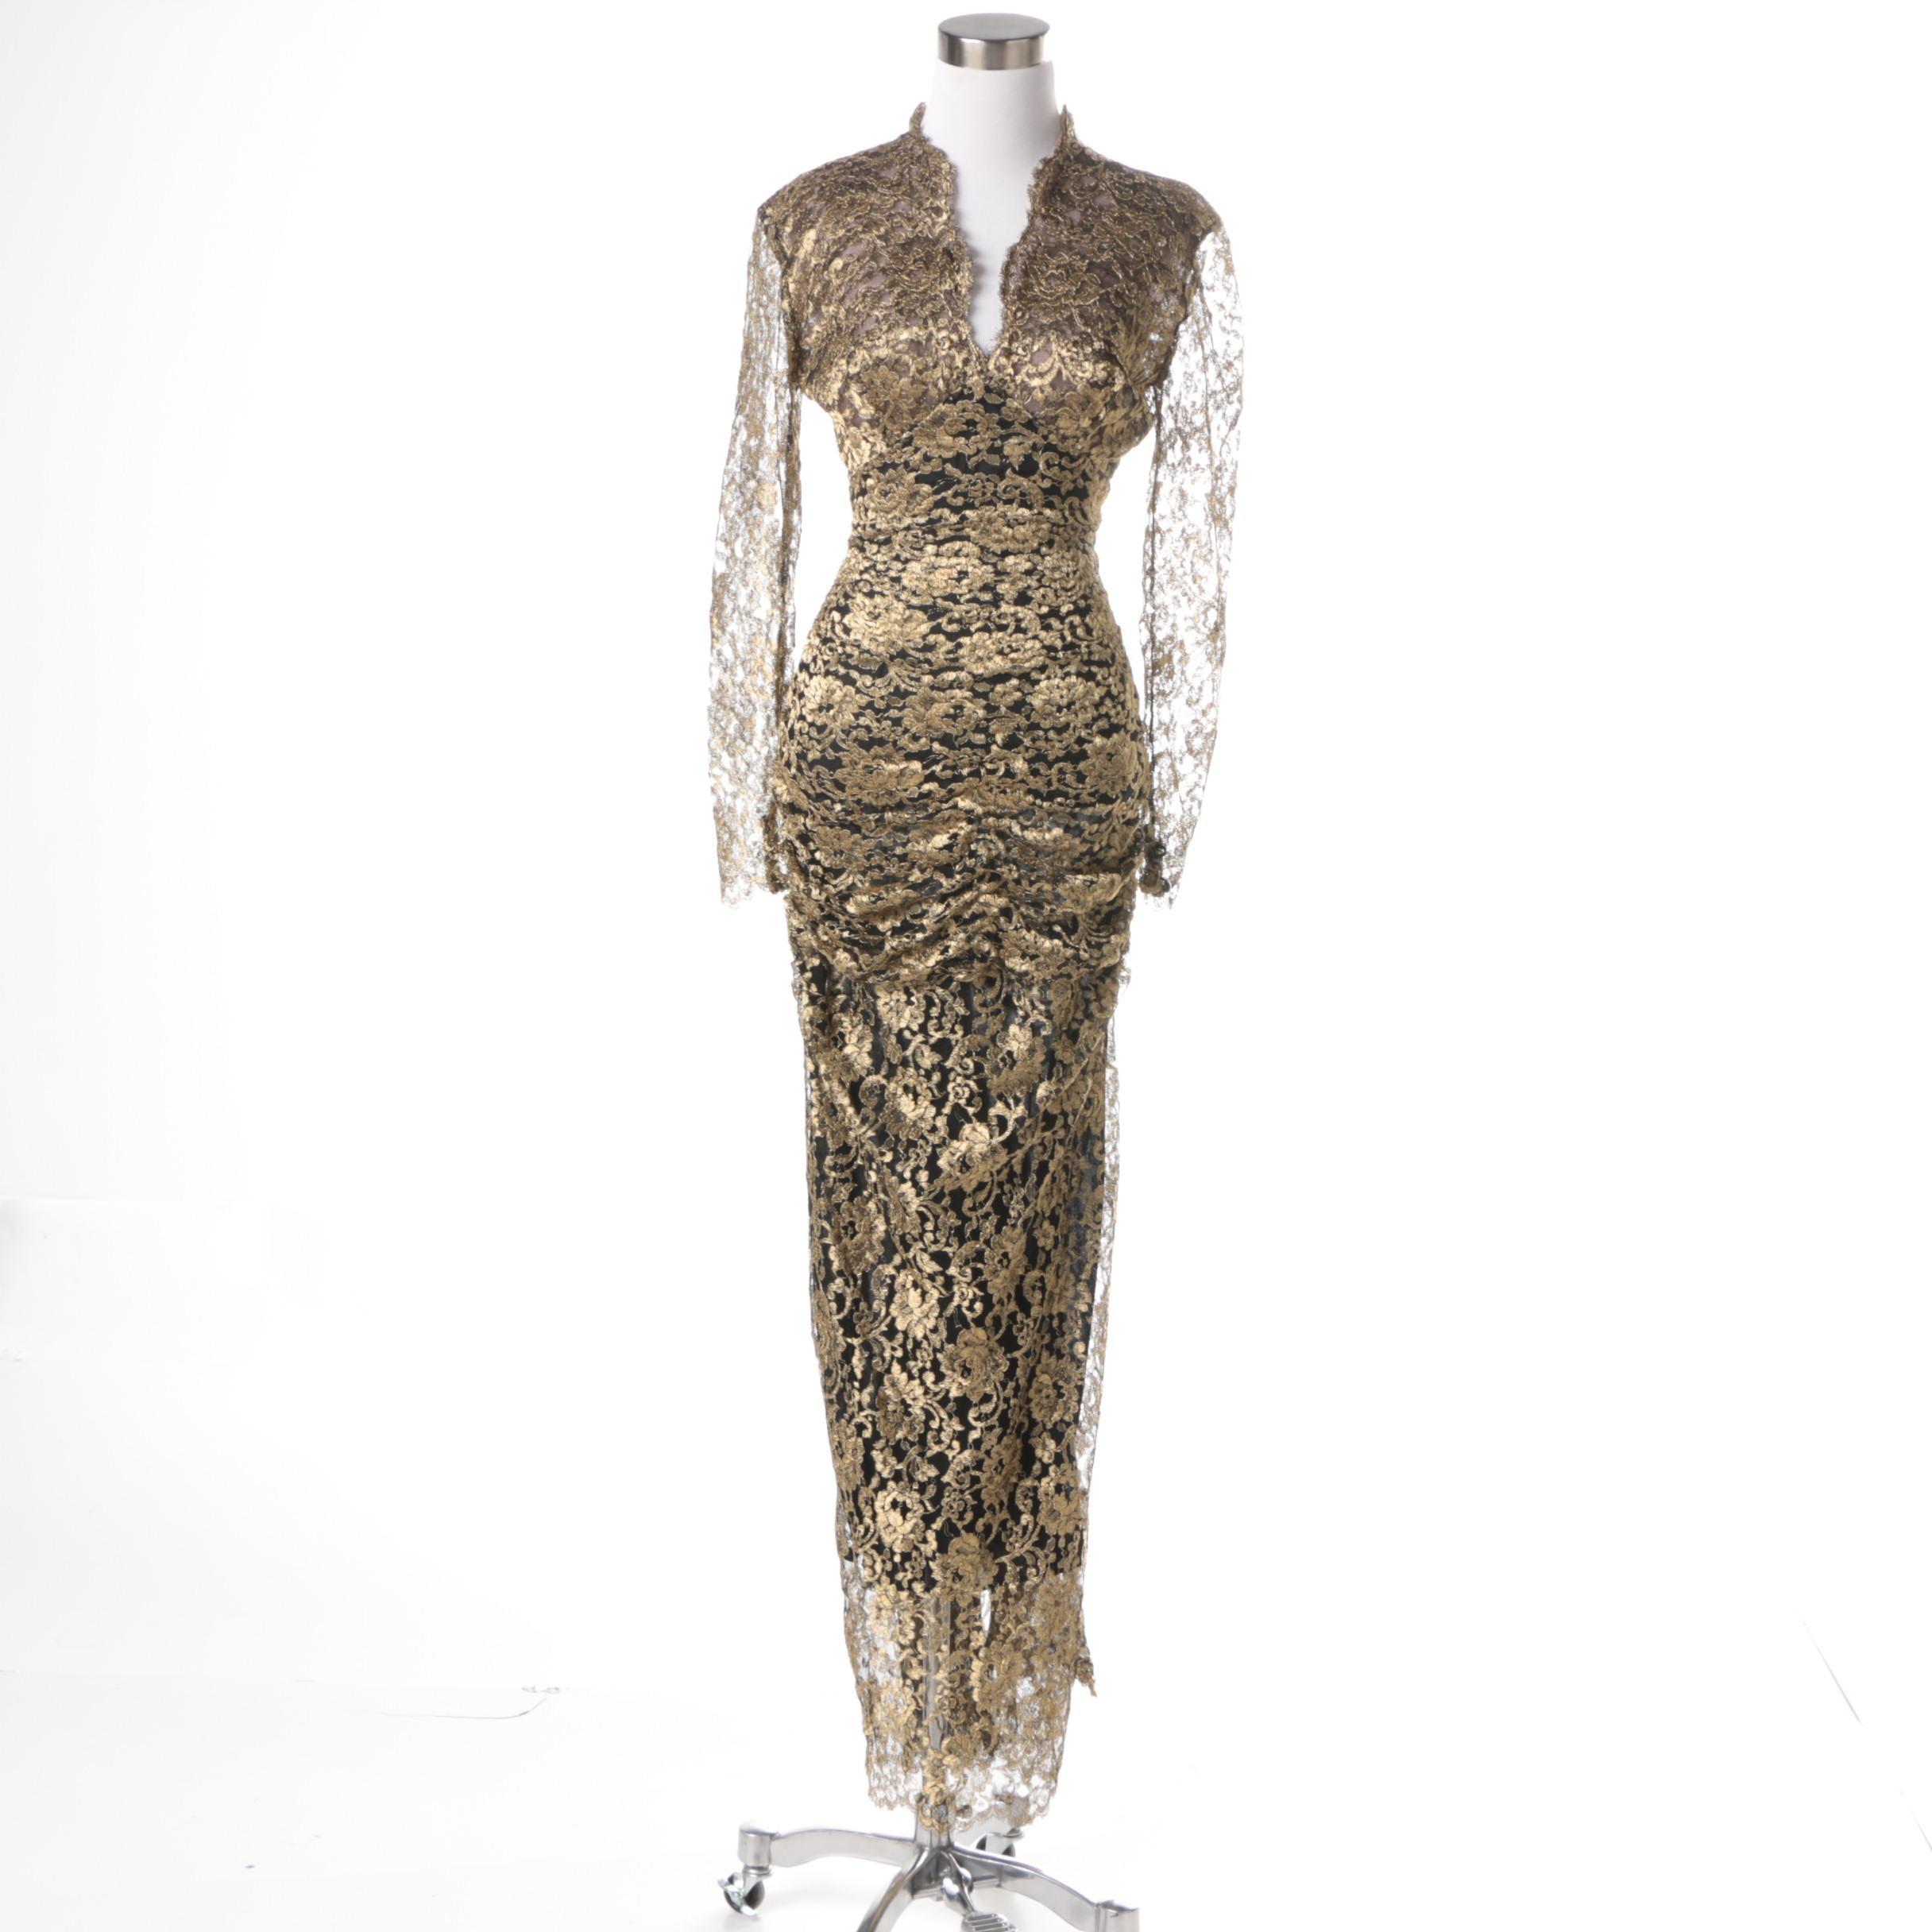 Isabelle Allard Embroidered Evening Gown